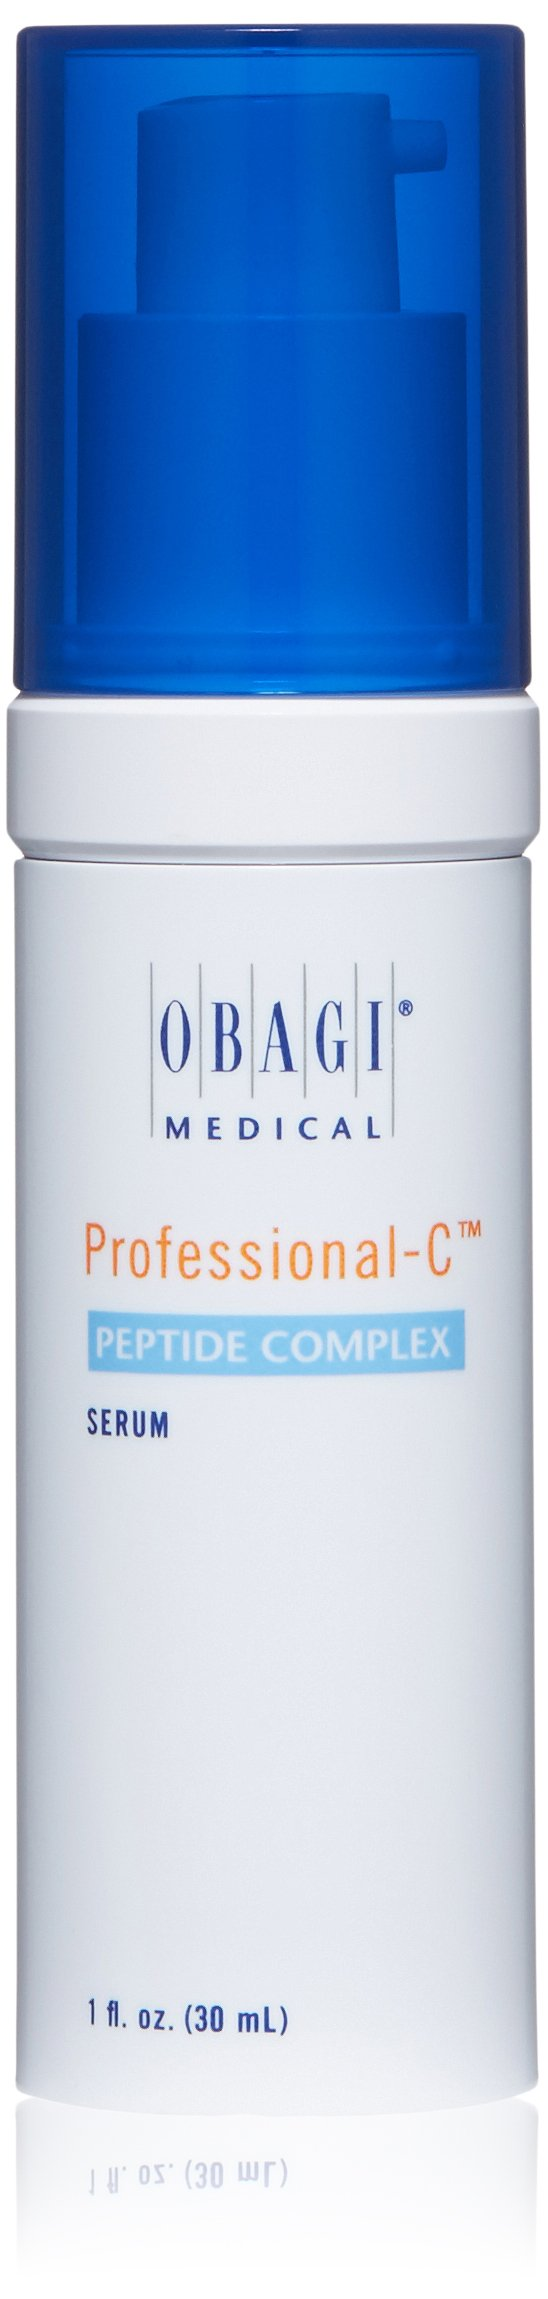 Obagi Professional-C Peptide Complex, 1 fl. oz.